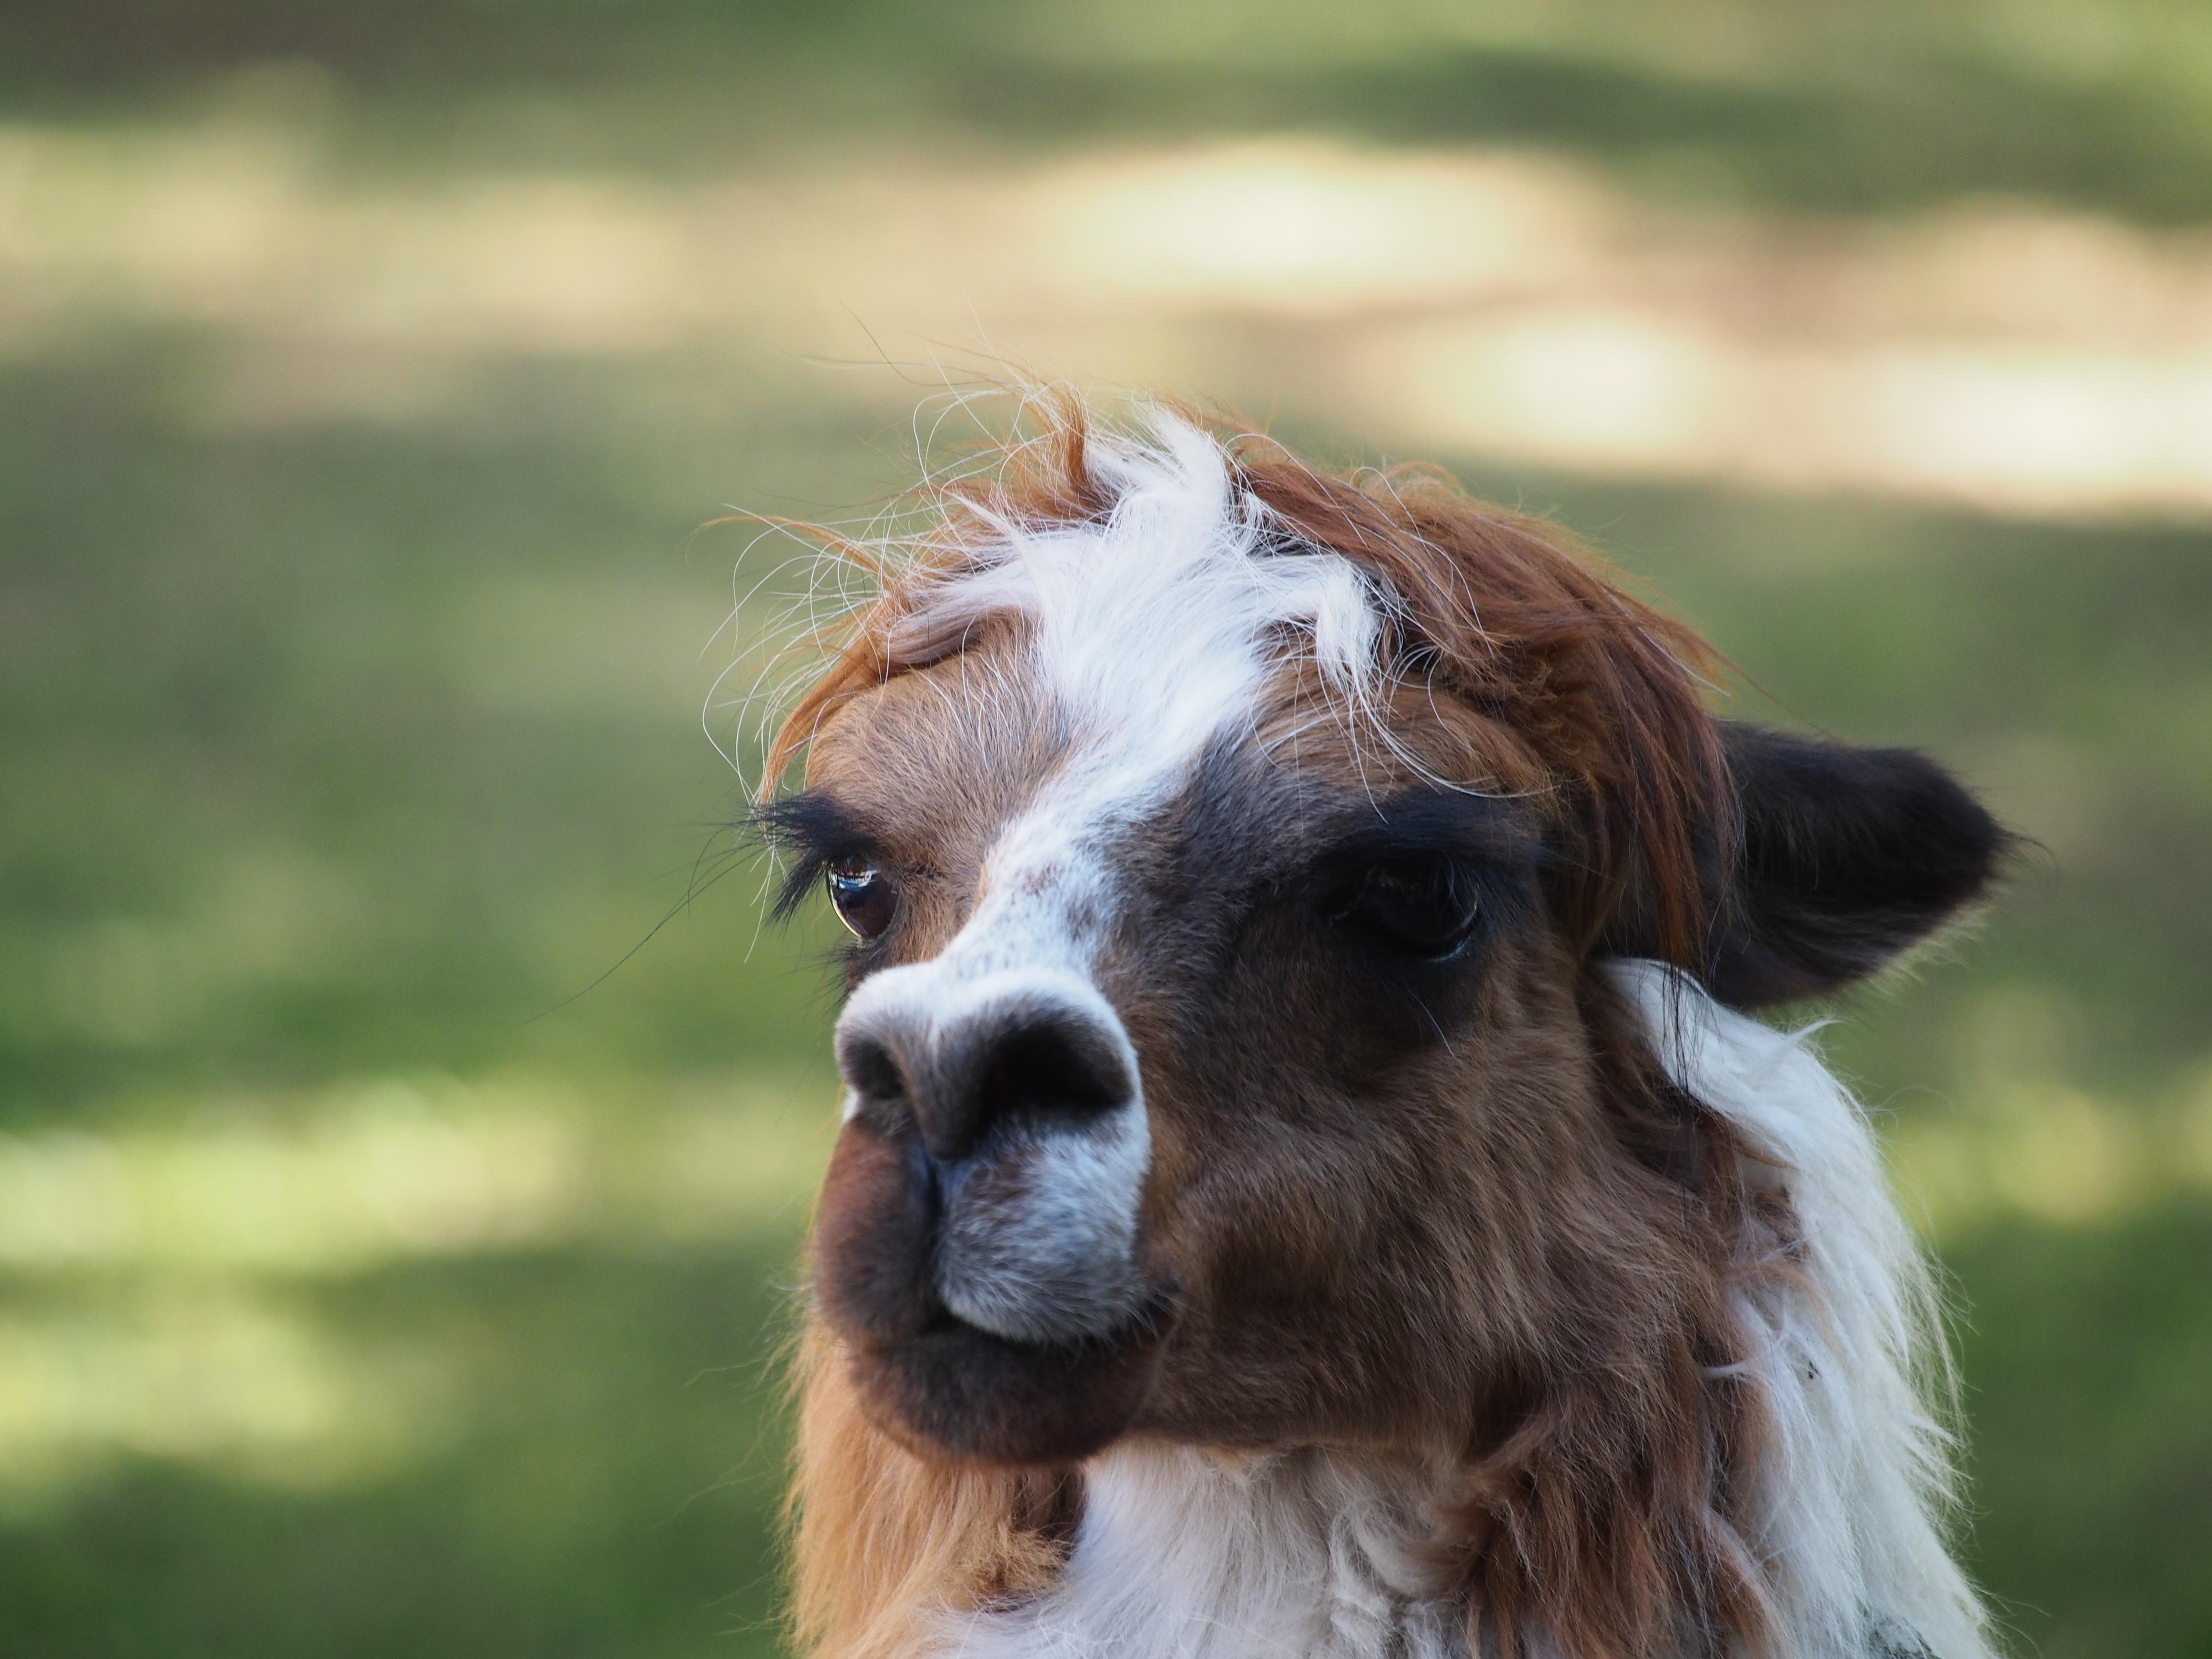 Alpaca contemplating life, Alpaca, Life, Wildlife, Smell, HQ Photo